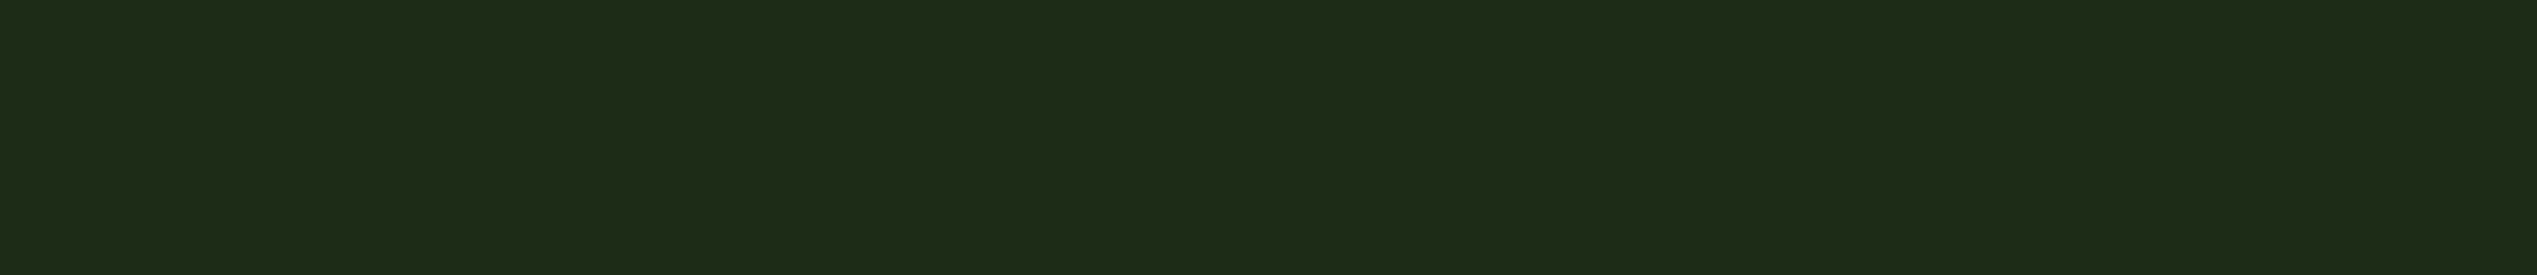 Columbia Sprint Lucid Logos